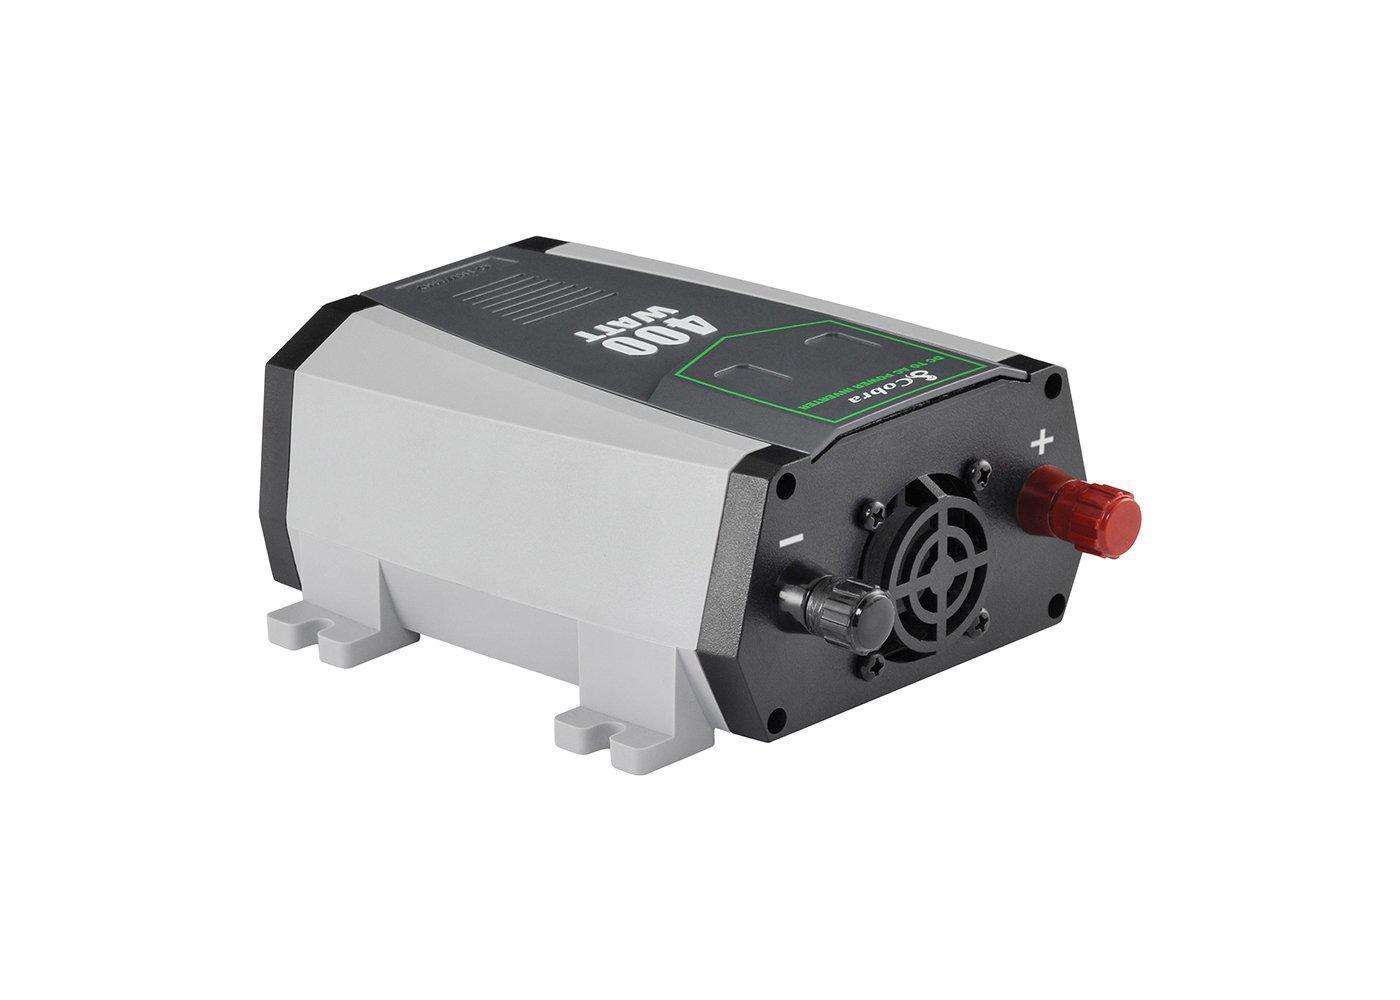 CPI490 - Cobra® Compact Power Inverter